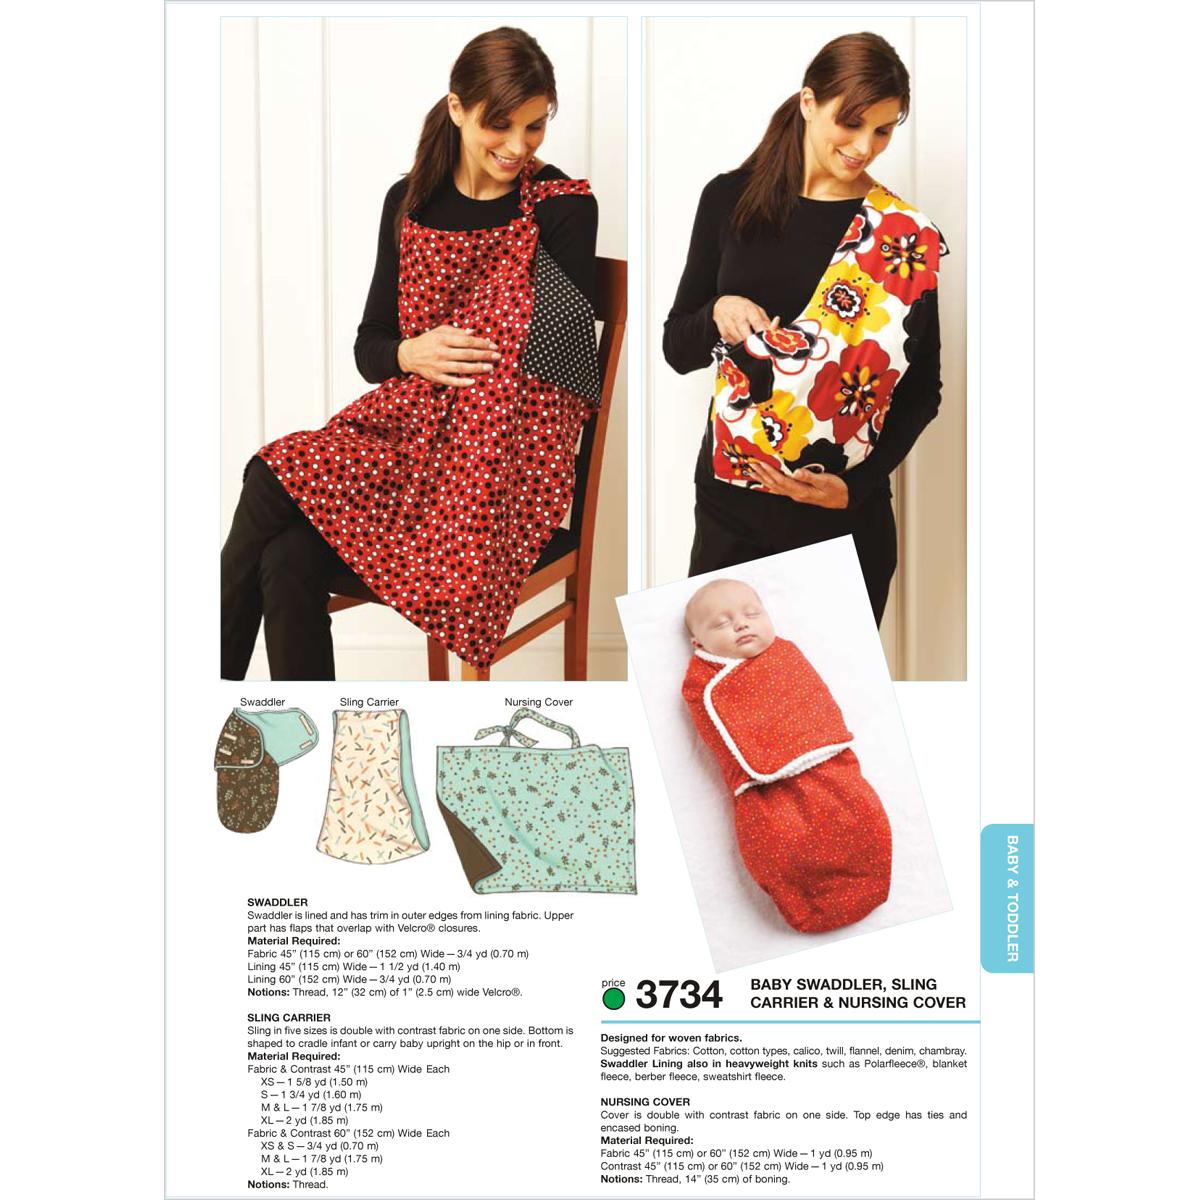 Swaddler, Sling Carrier & Nursing Cover-SLING: XS-S-M-L-XL Pattern ...